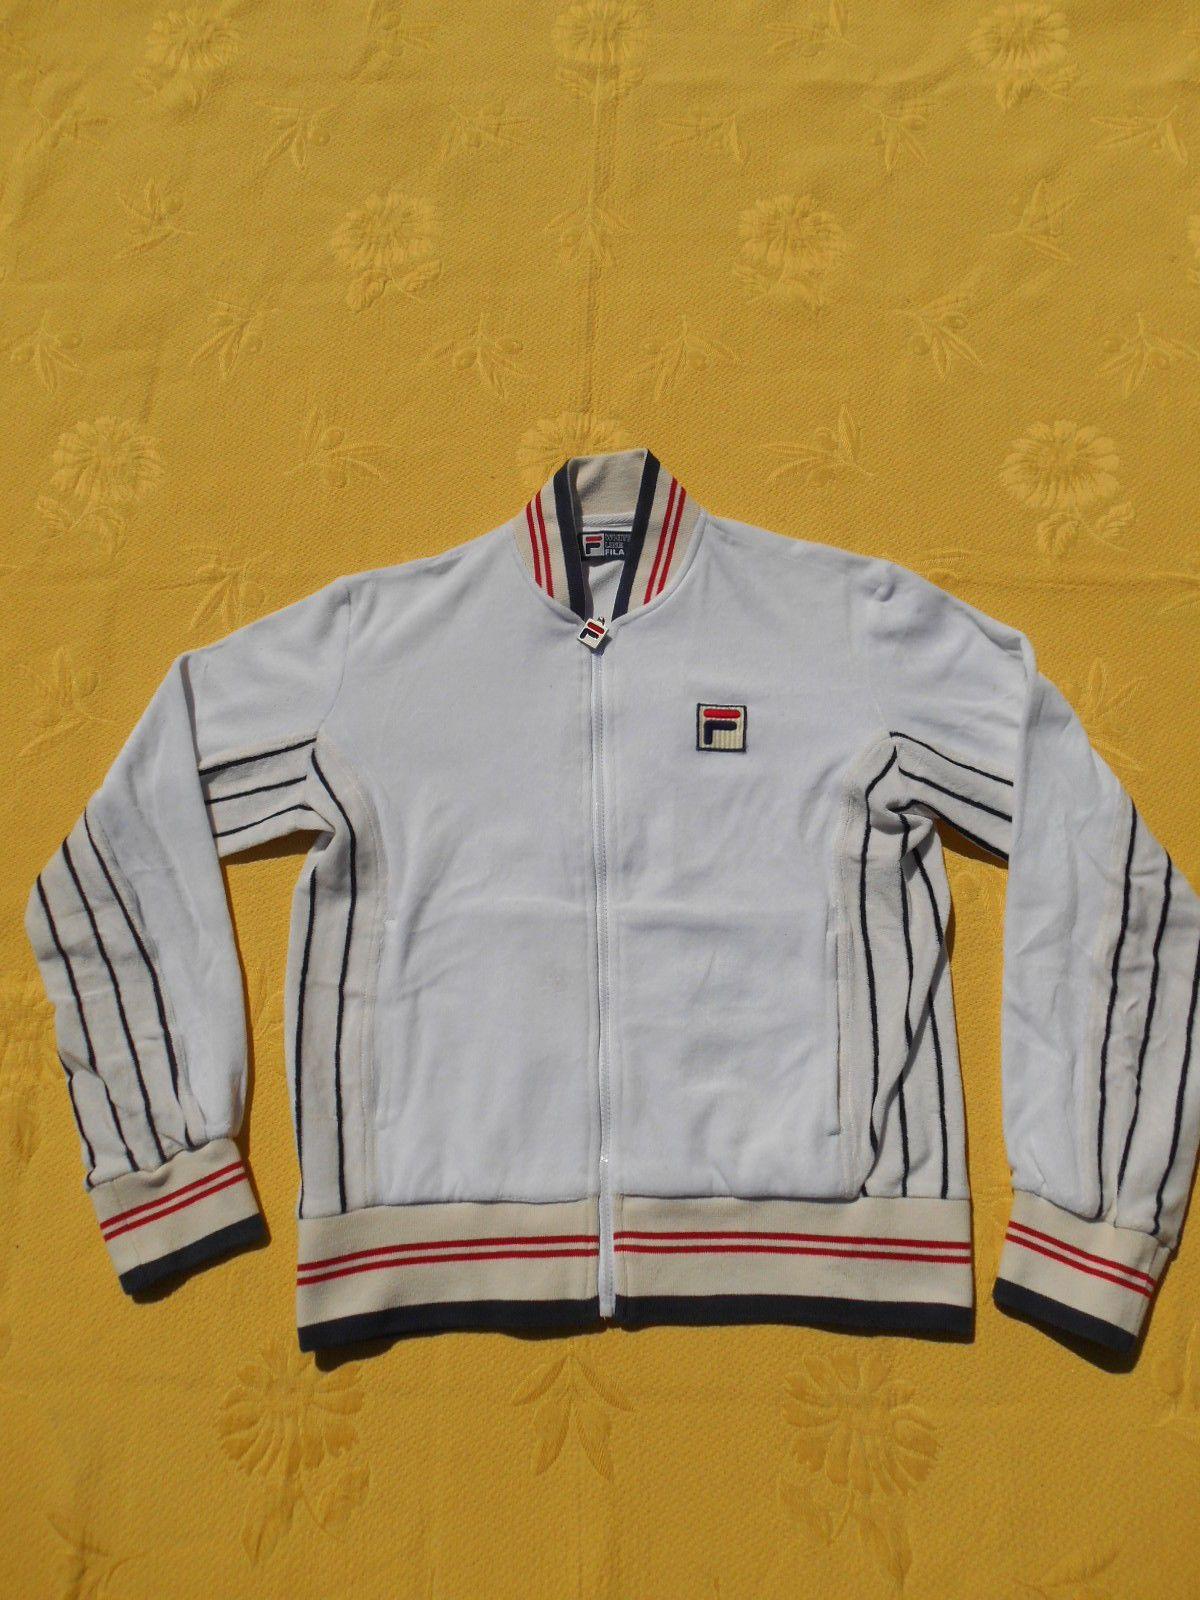 Q6twxt Veste Adidas Ebay Ebay Veste Vintage Adidas Q6twxt Vintage Ebay qpgxyf1wZ